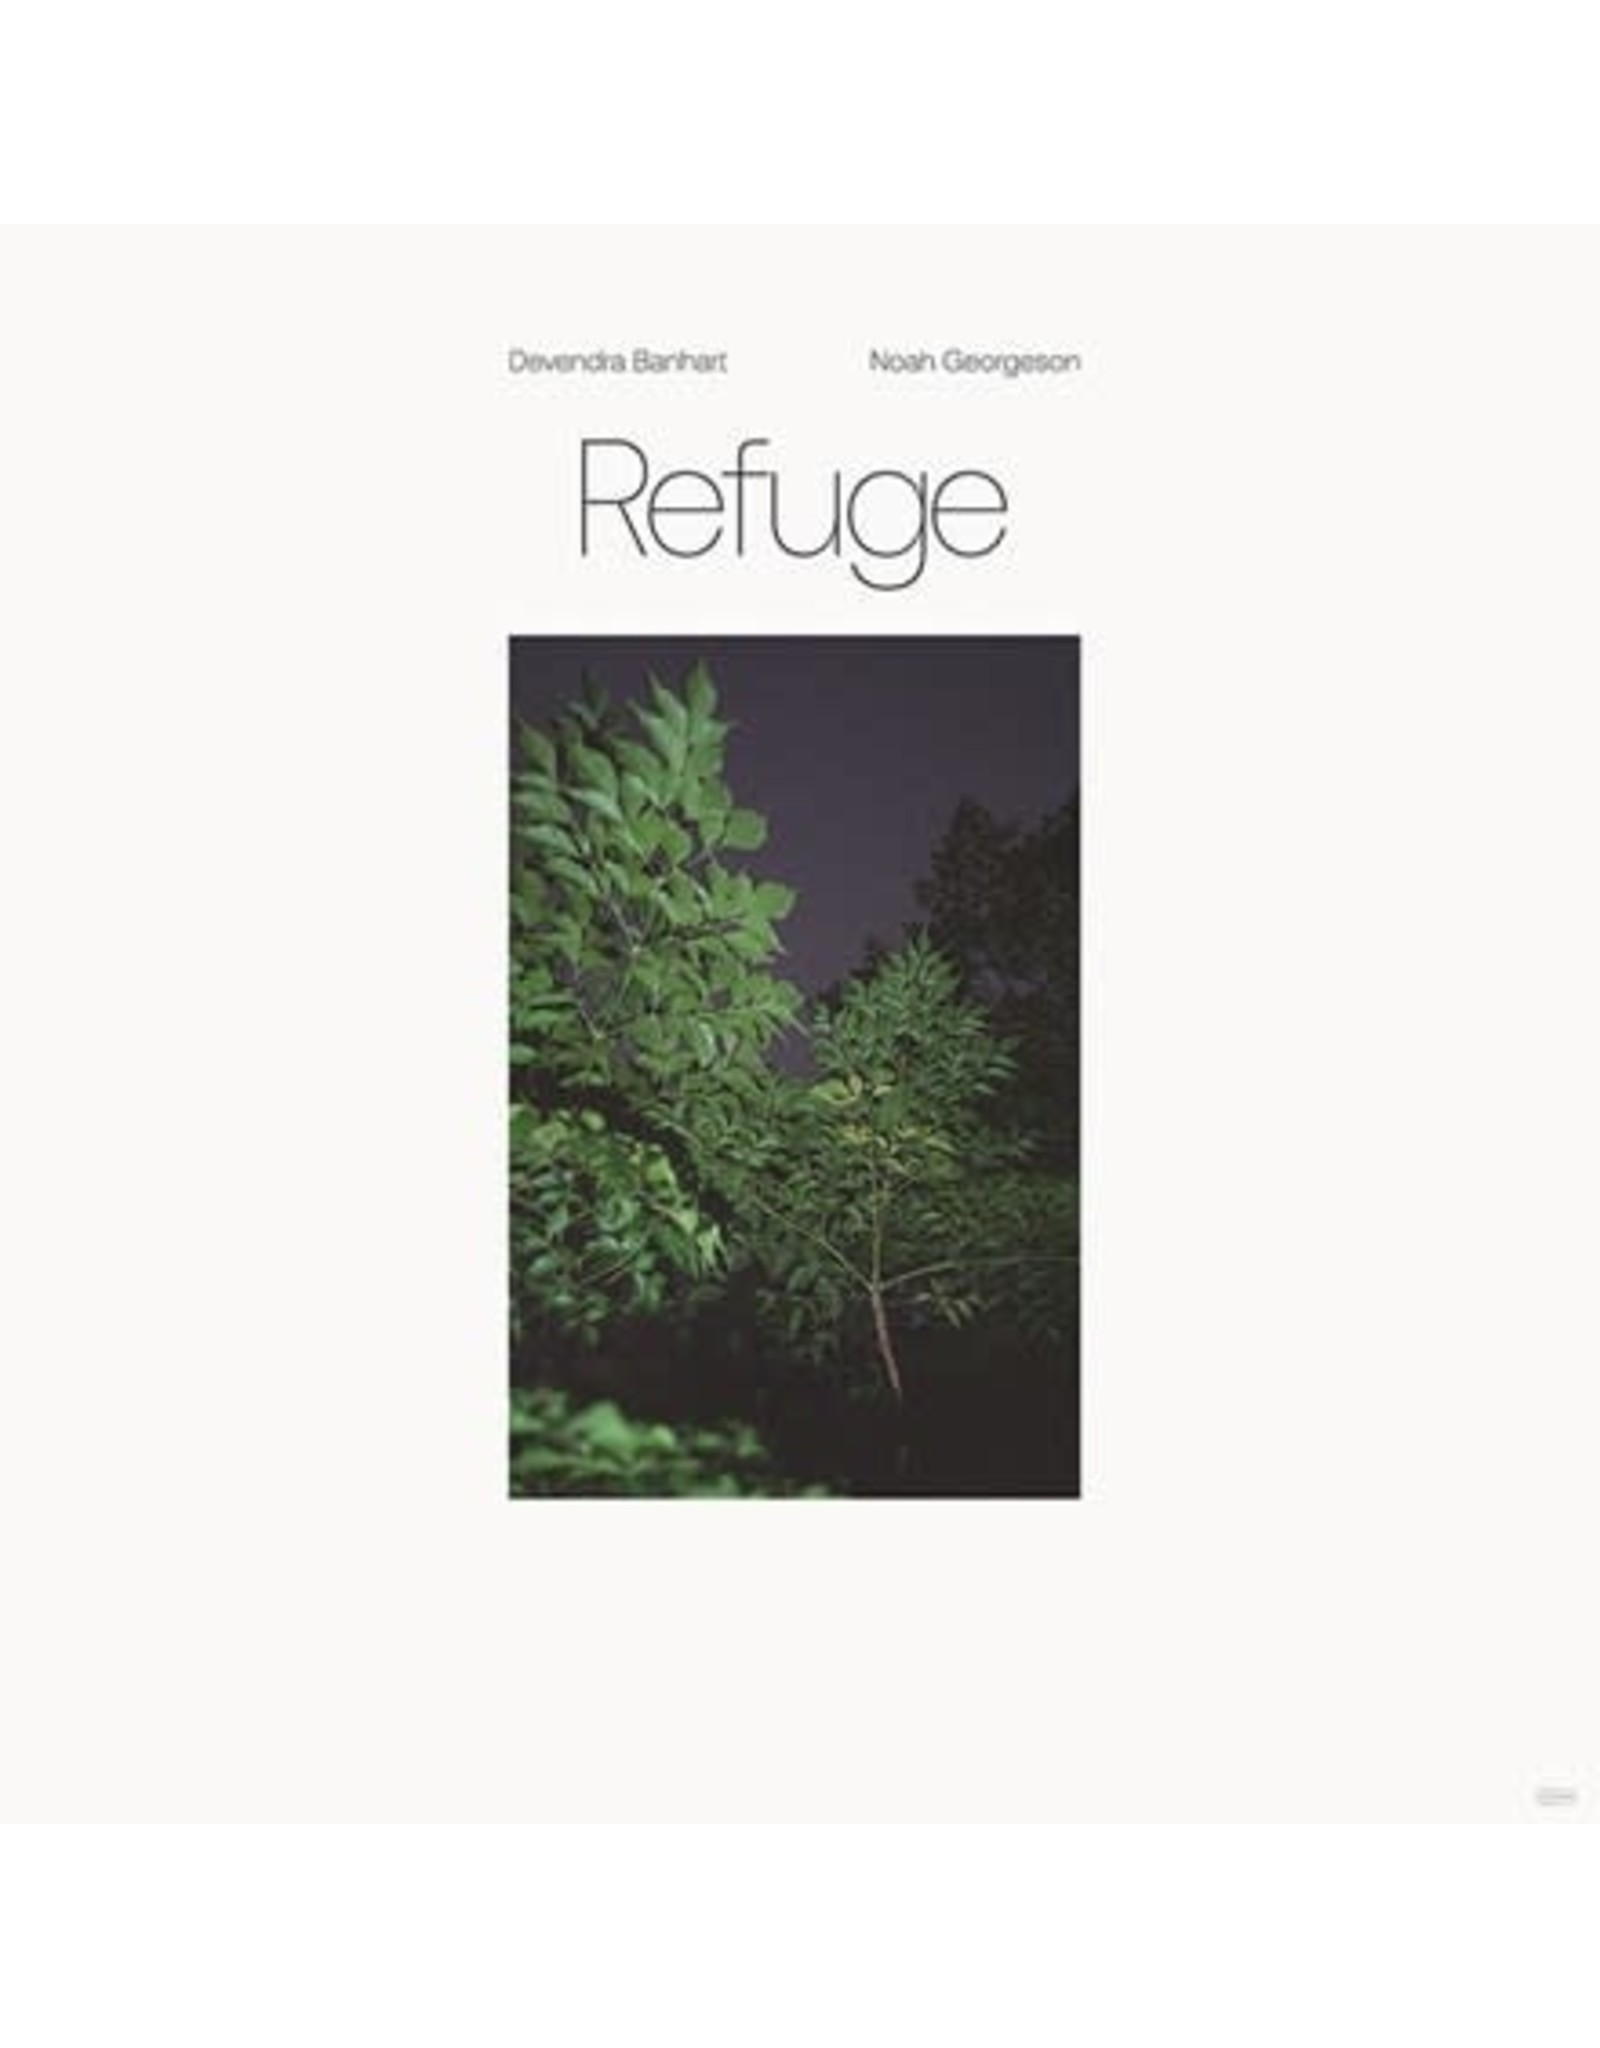 Dead Oceans Banhart, Devendra & Noah Georgeson: Refuge (blue seaglass wave translucent) LP